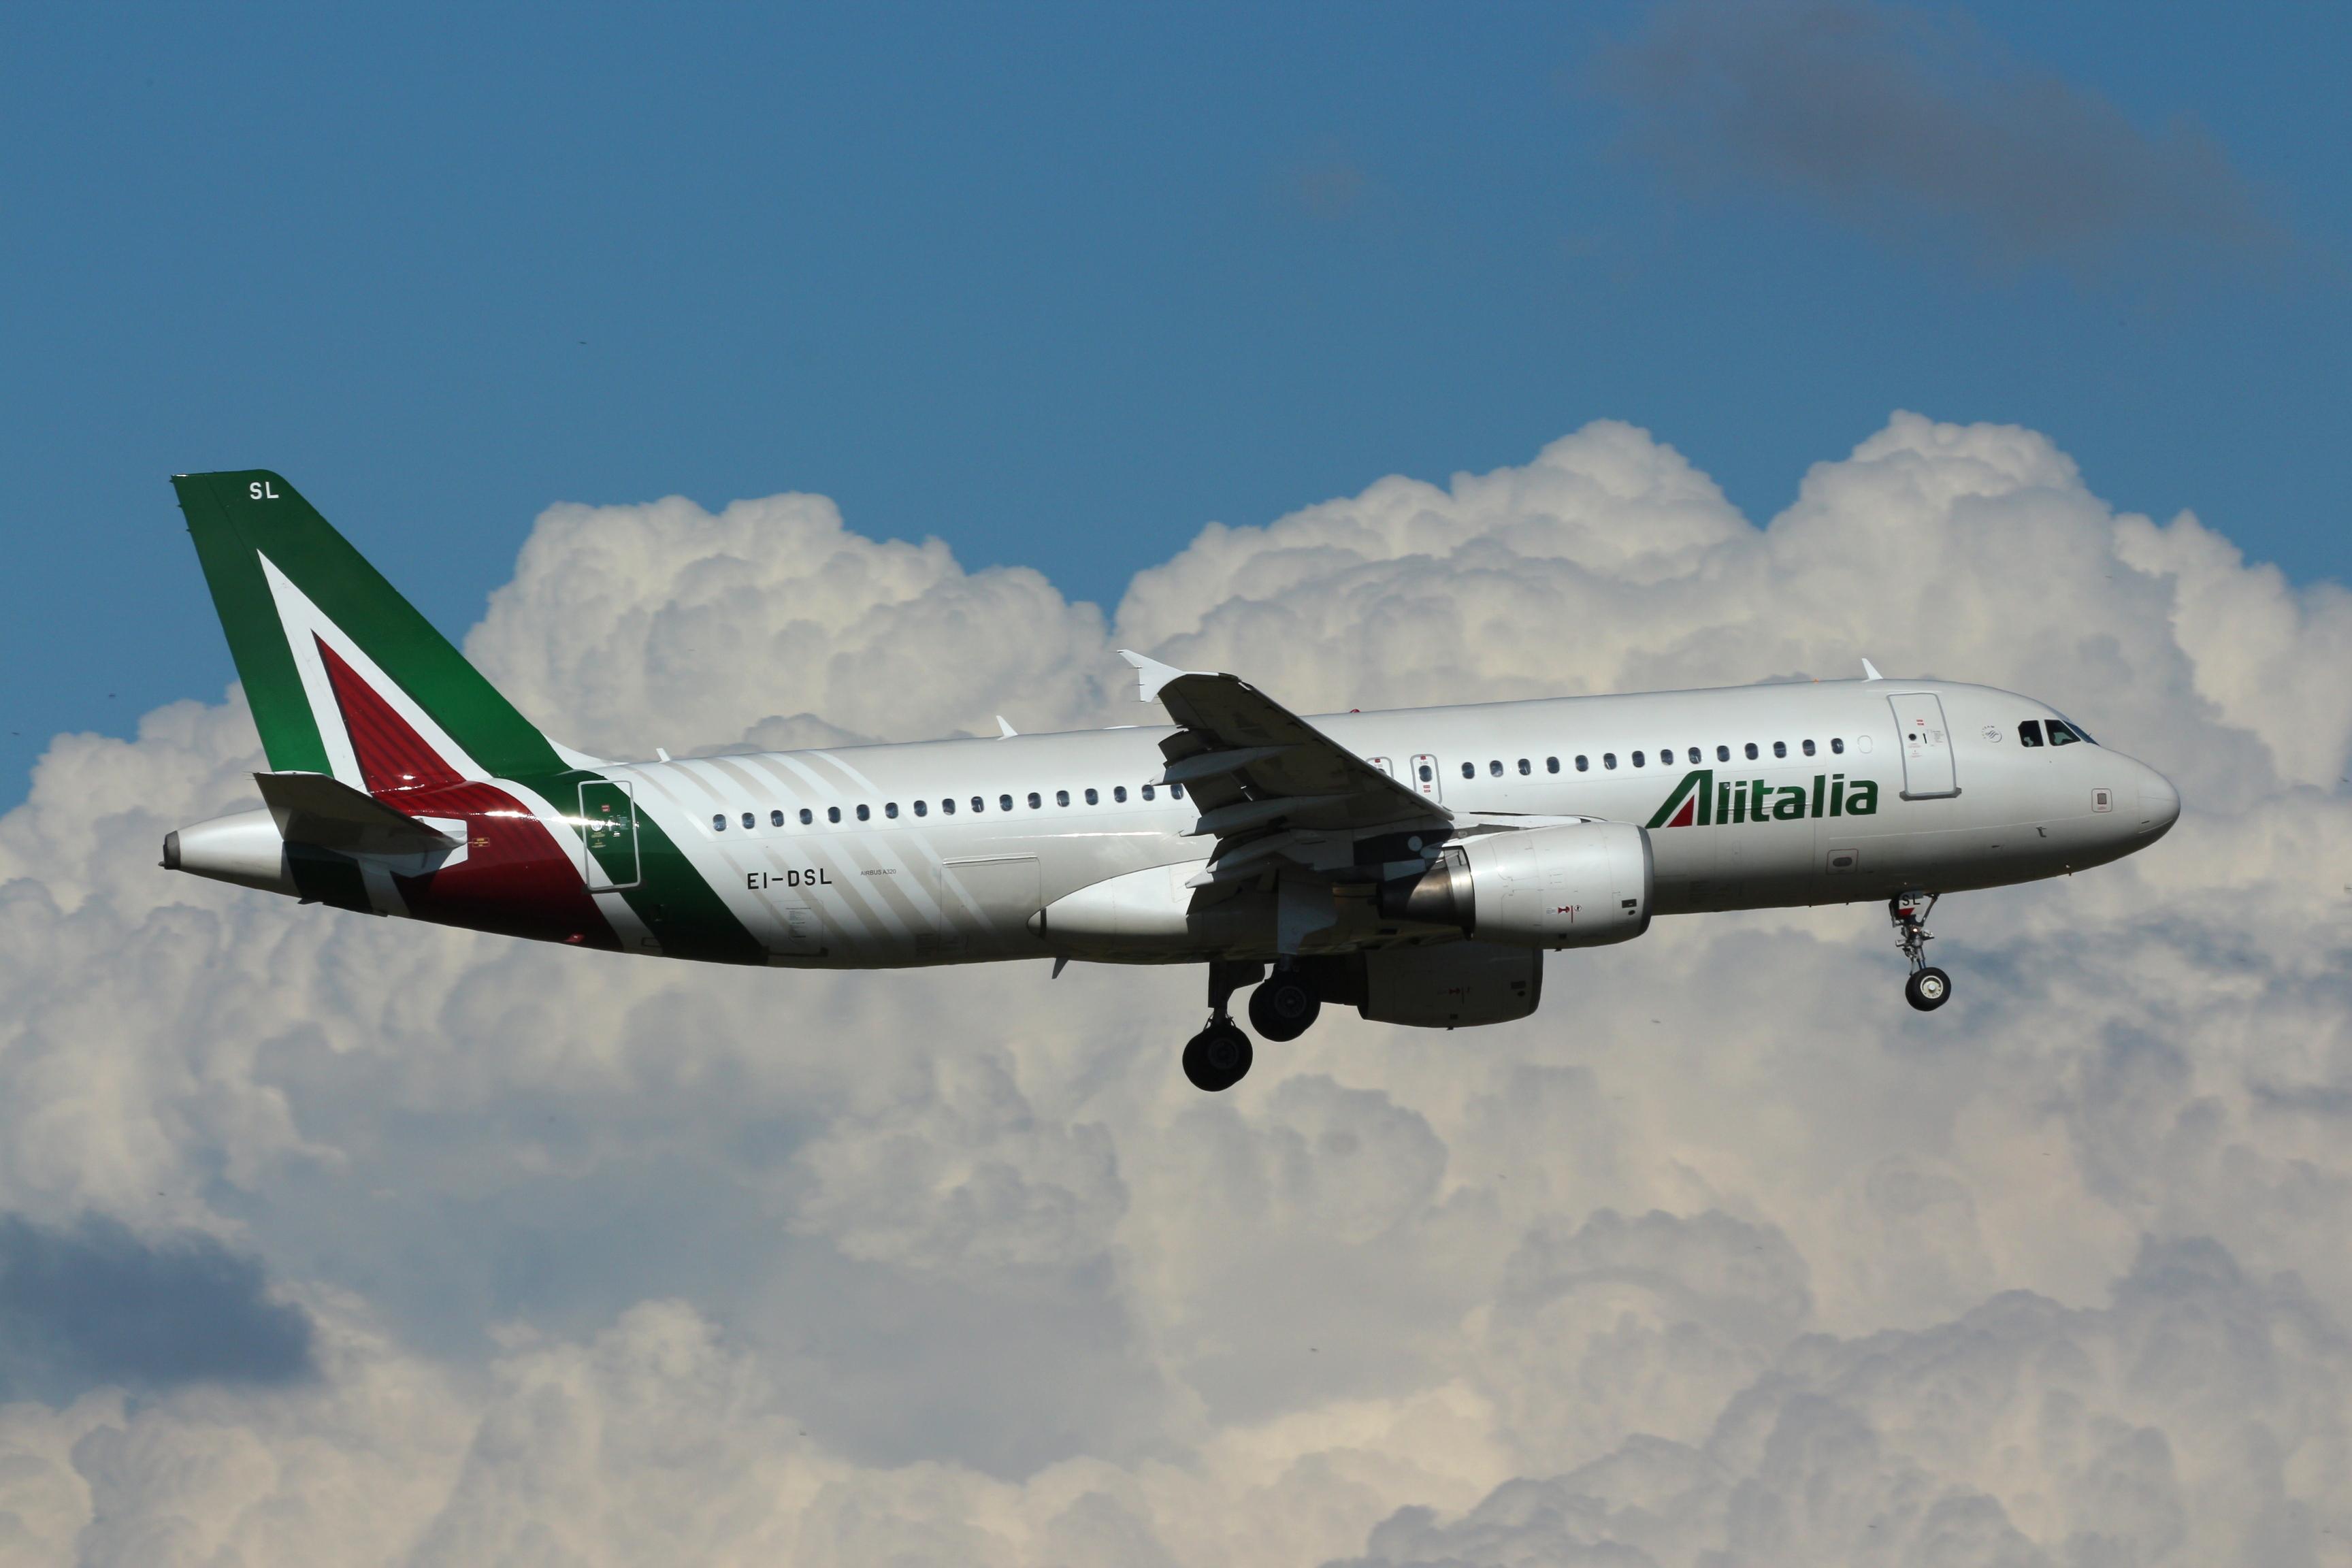 En Airbus A320 fra Alitalia. Foto: Alessandro Ambrosetti